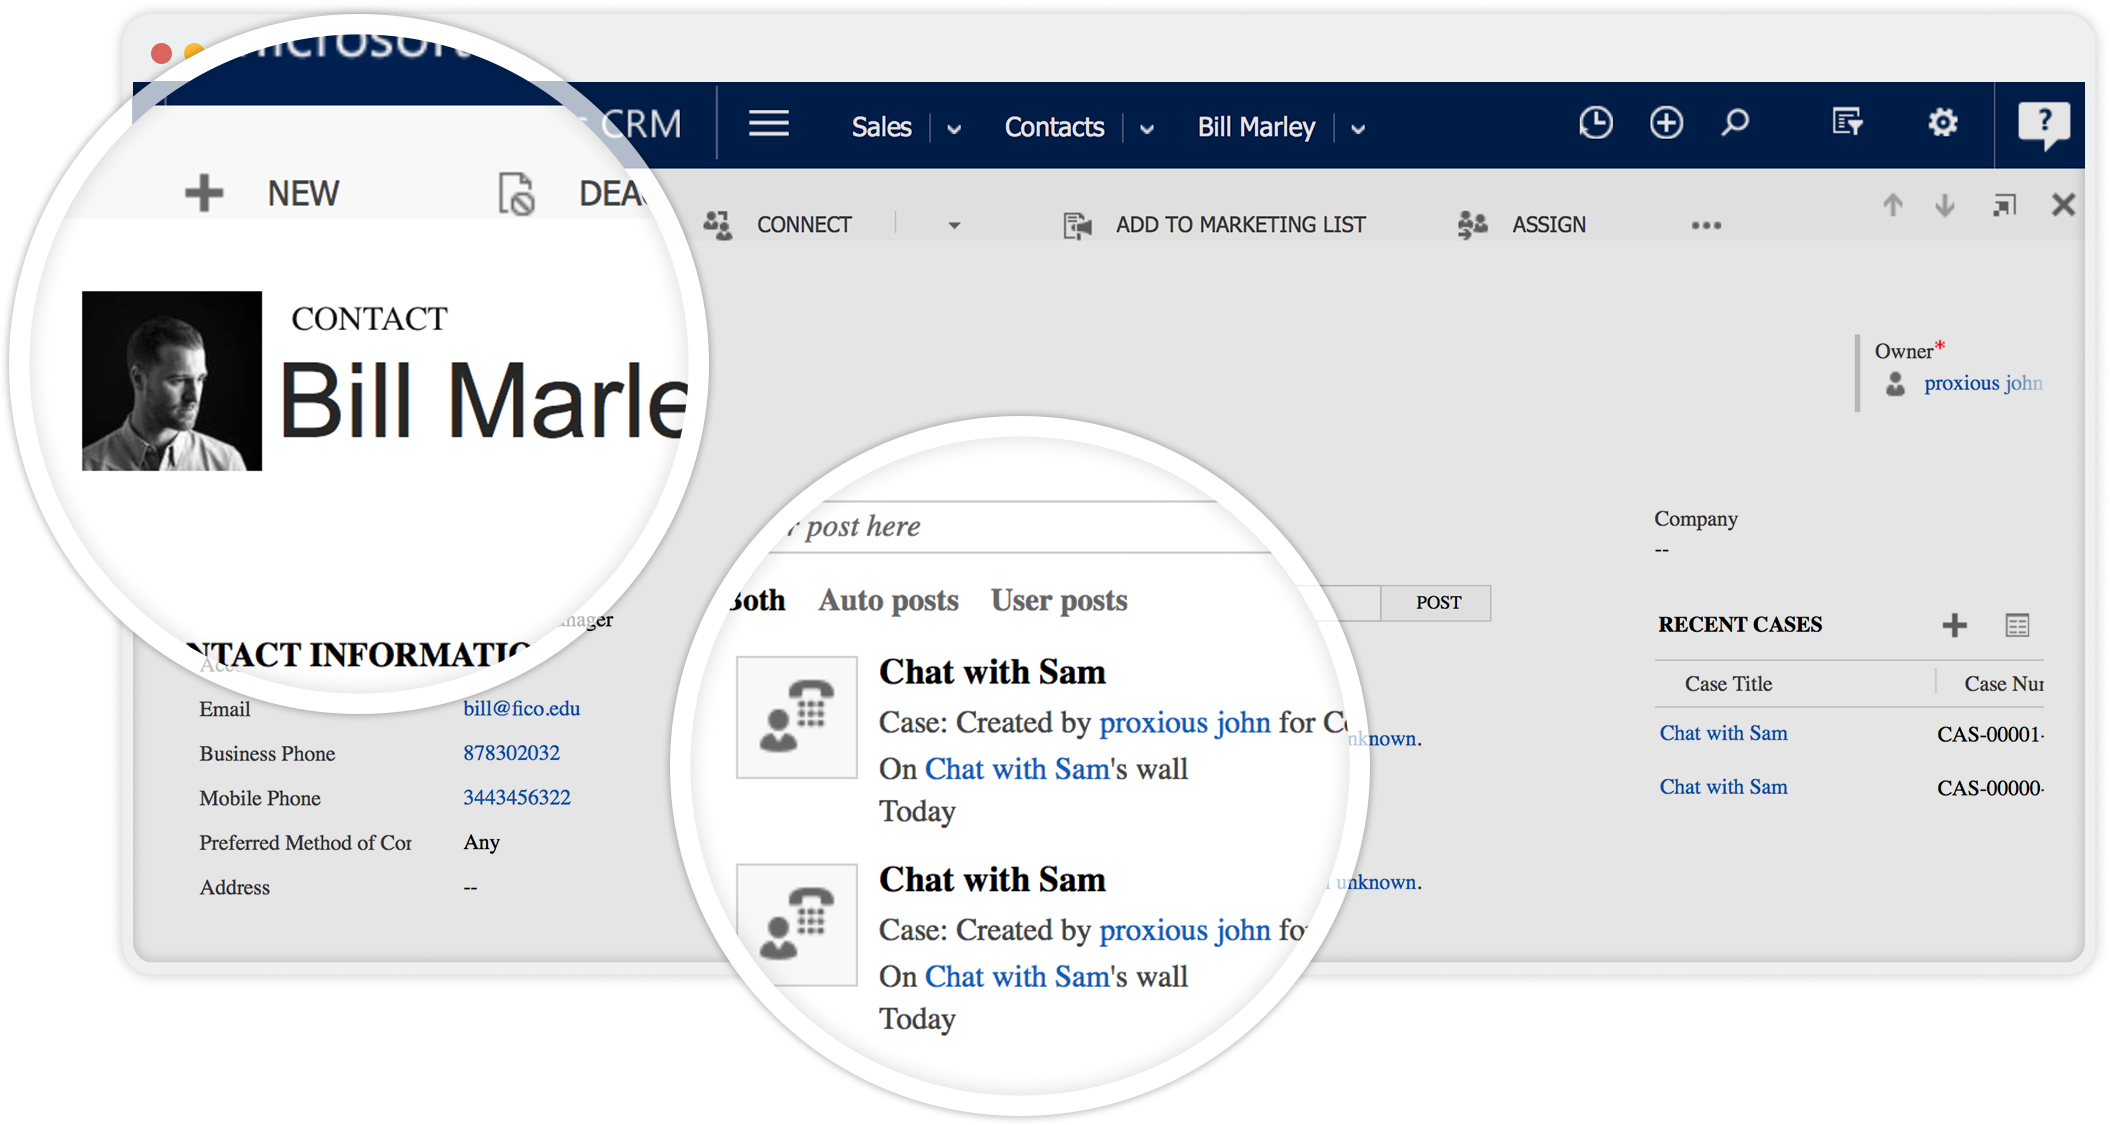 Chat transcripts on Microsoft Dynamics CRM